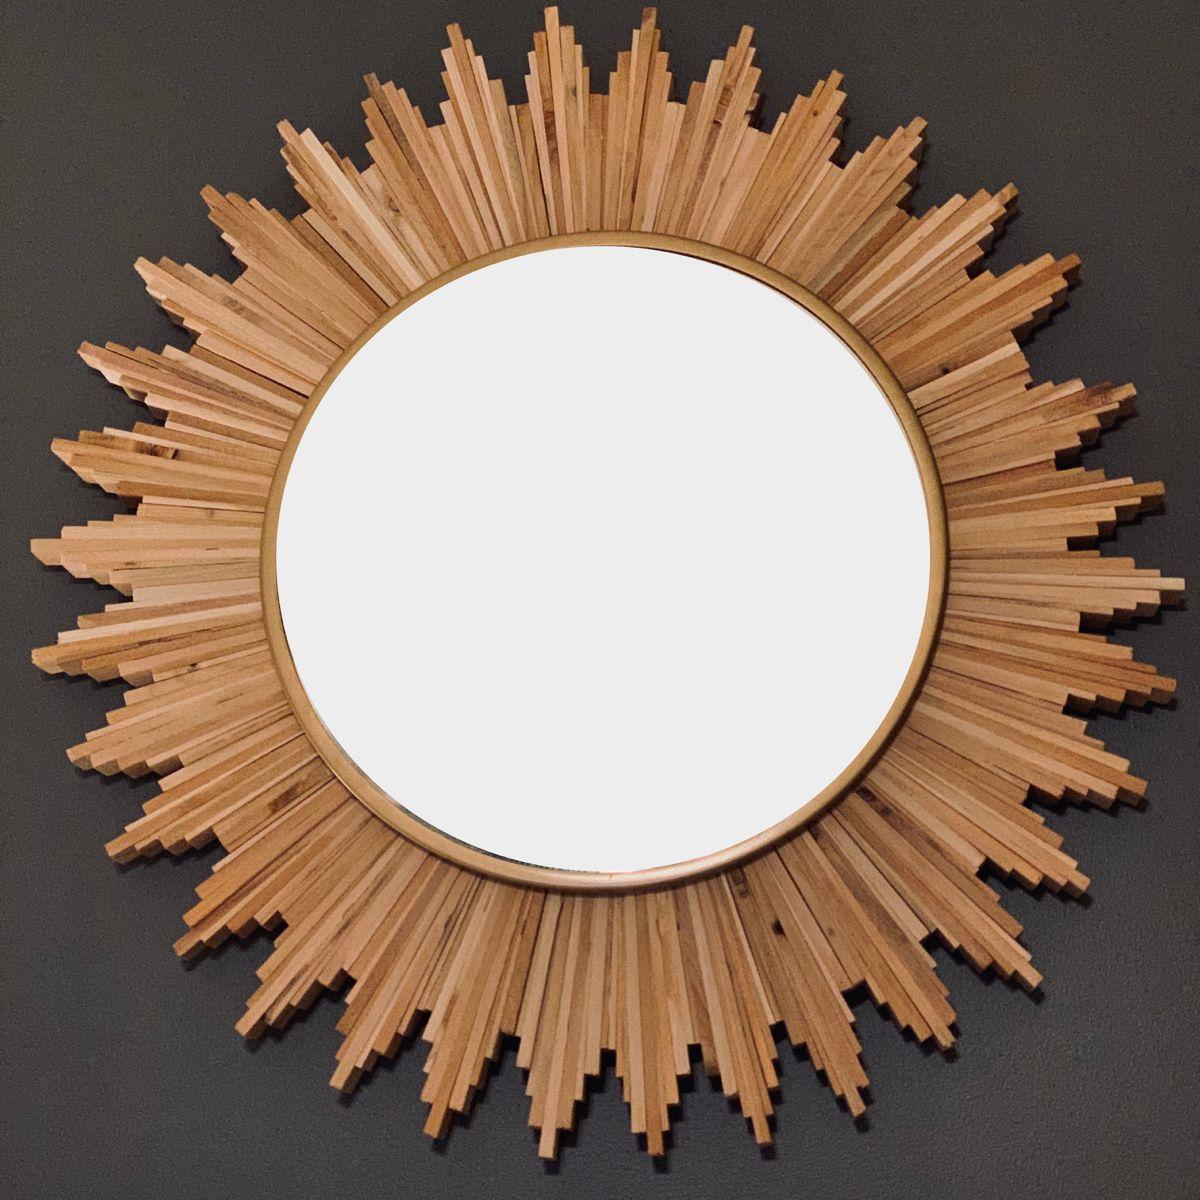 Natural Wood And Bronze Rustic Sunburst Wall Mirror With Images Sunburst Mirror Sunburst Mirror